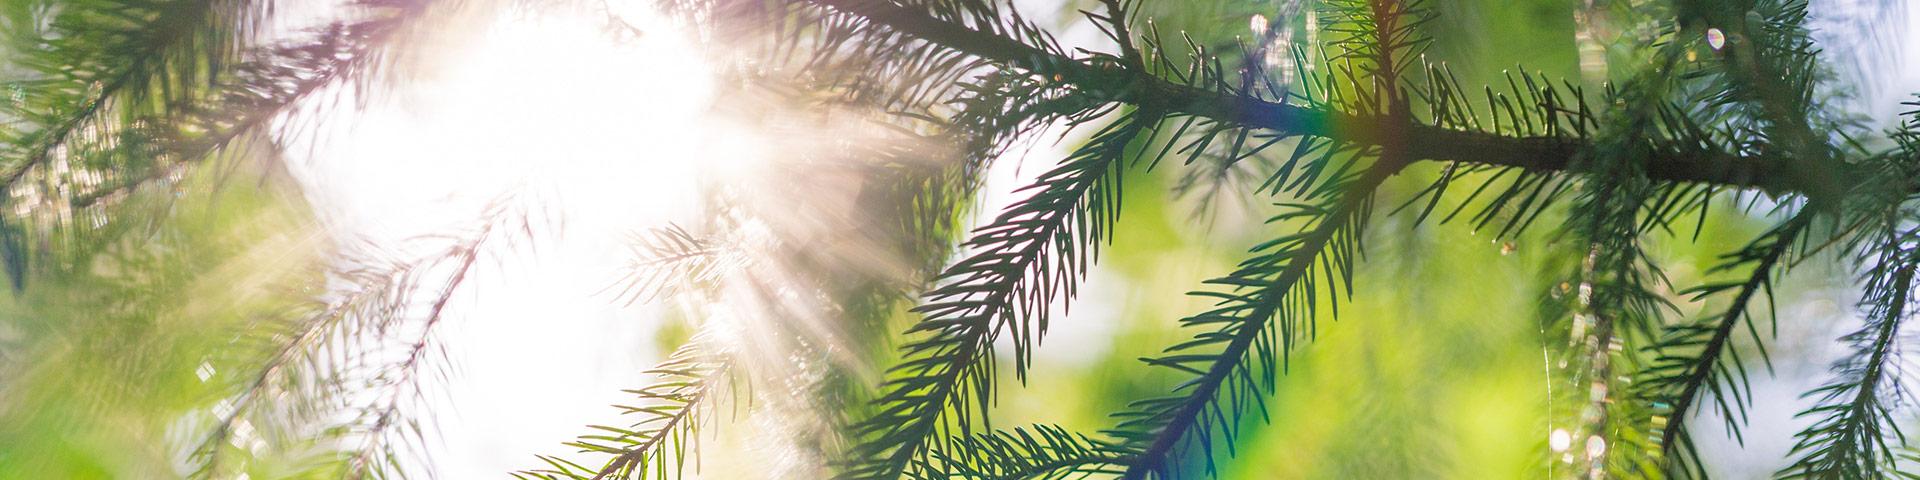 Uusi Puu hanke - Kertoo mihin puu pystyy